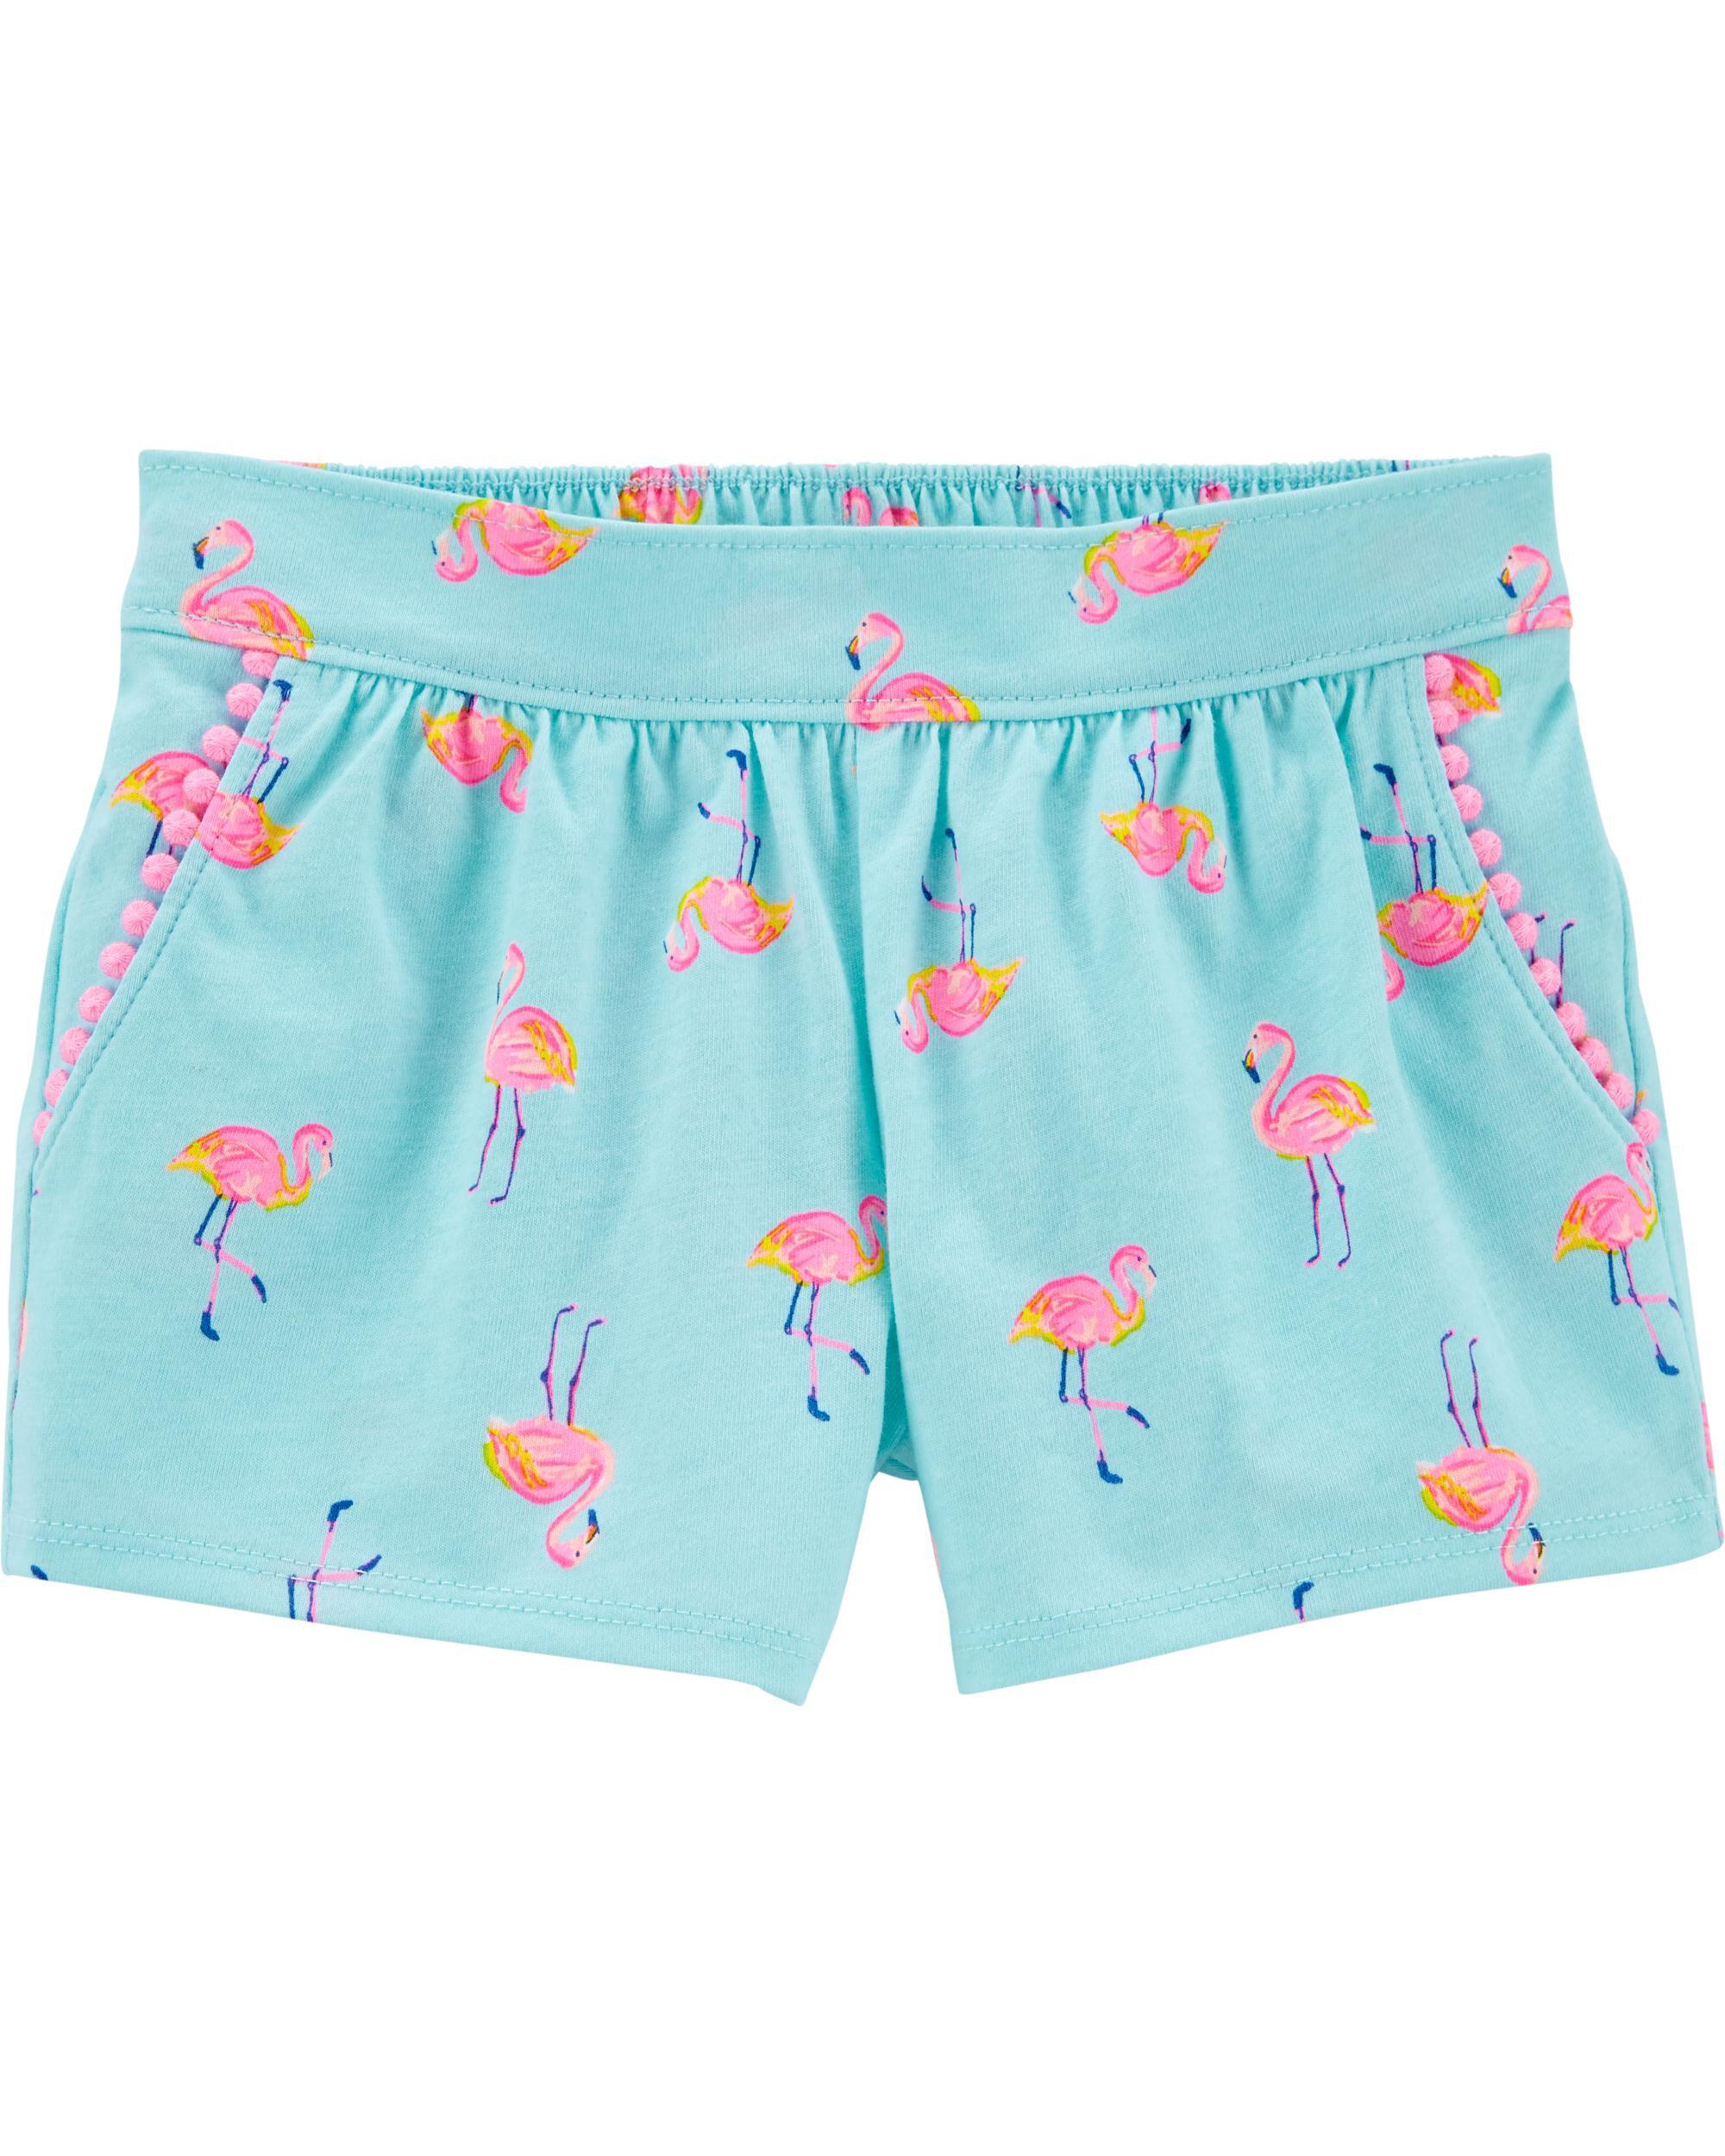 *DOORBUSTER*Flamingo Pom Pom Shorts